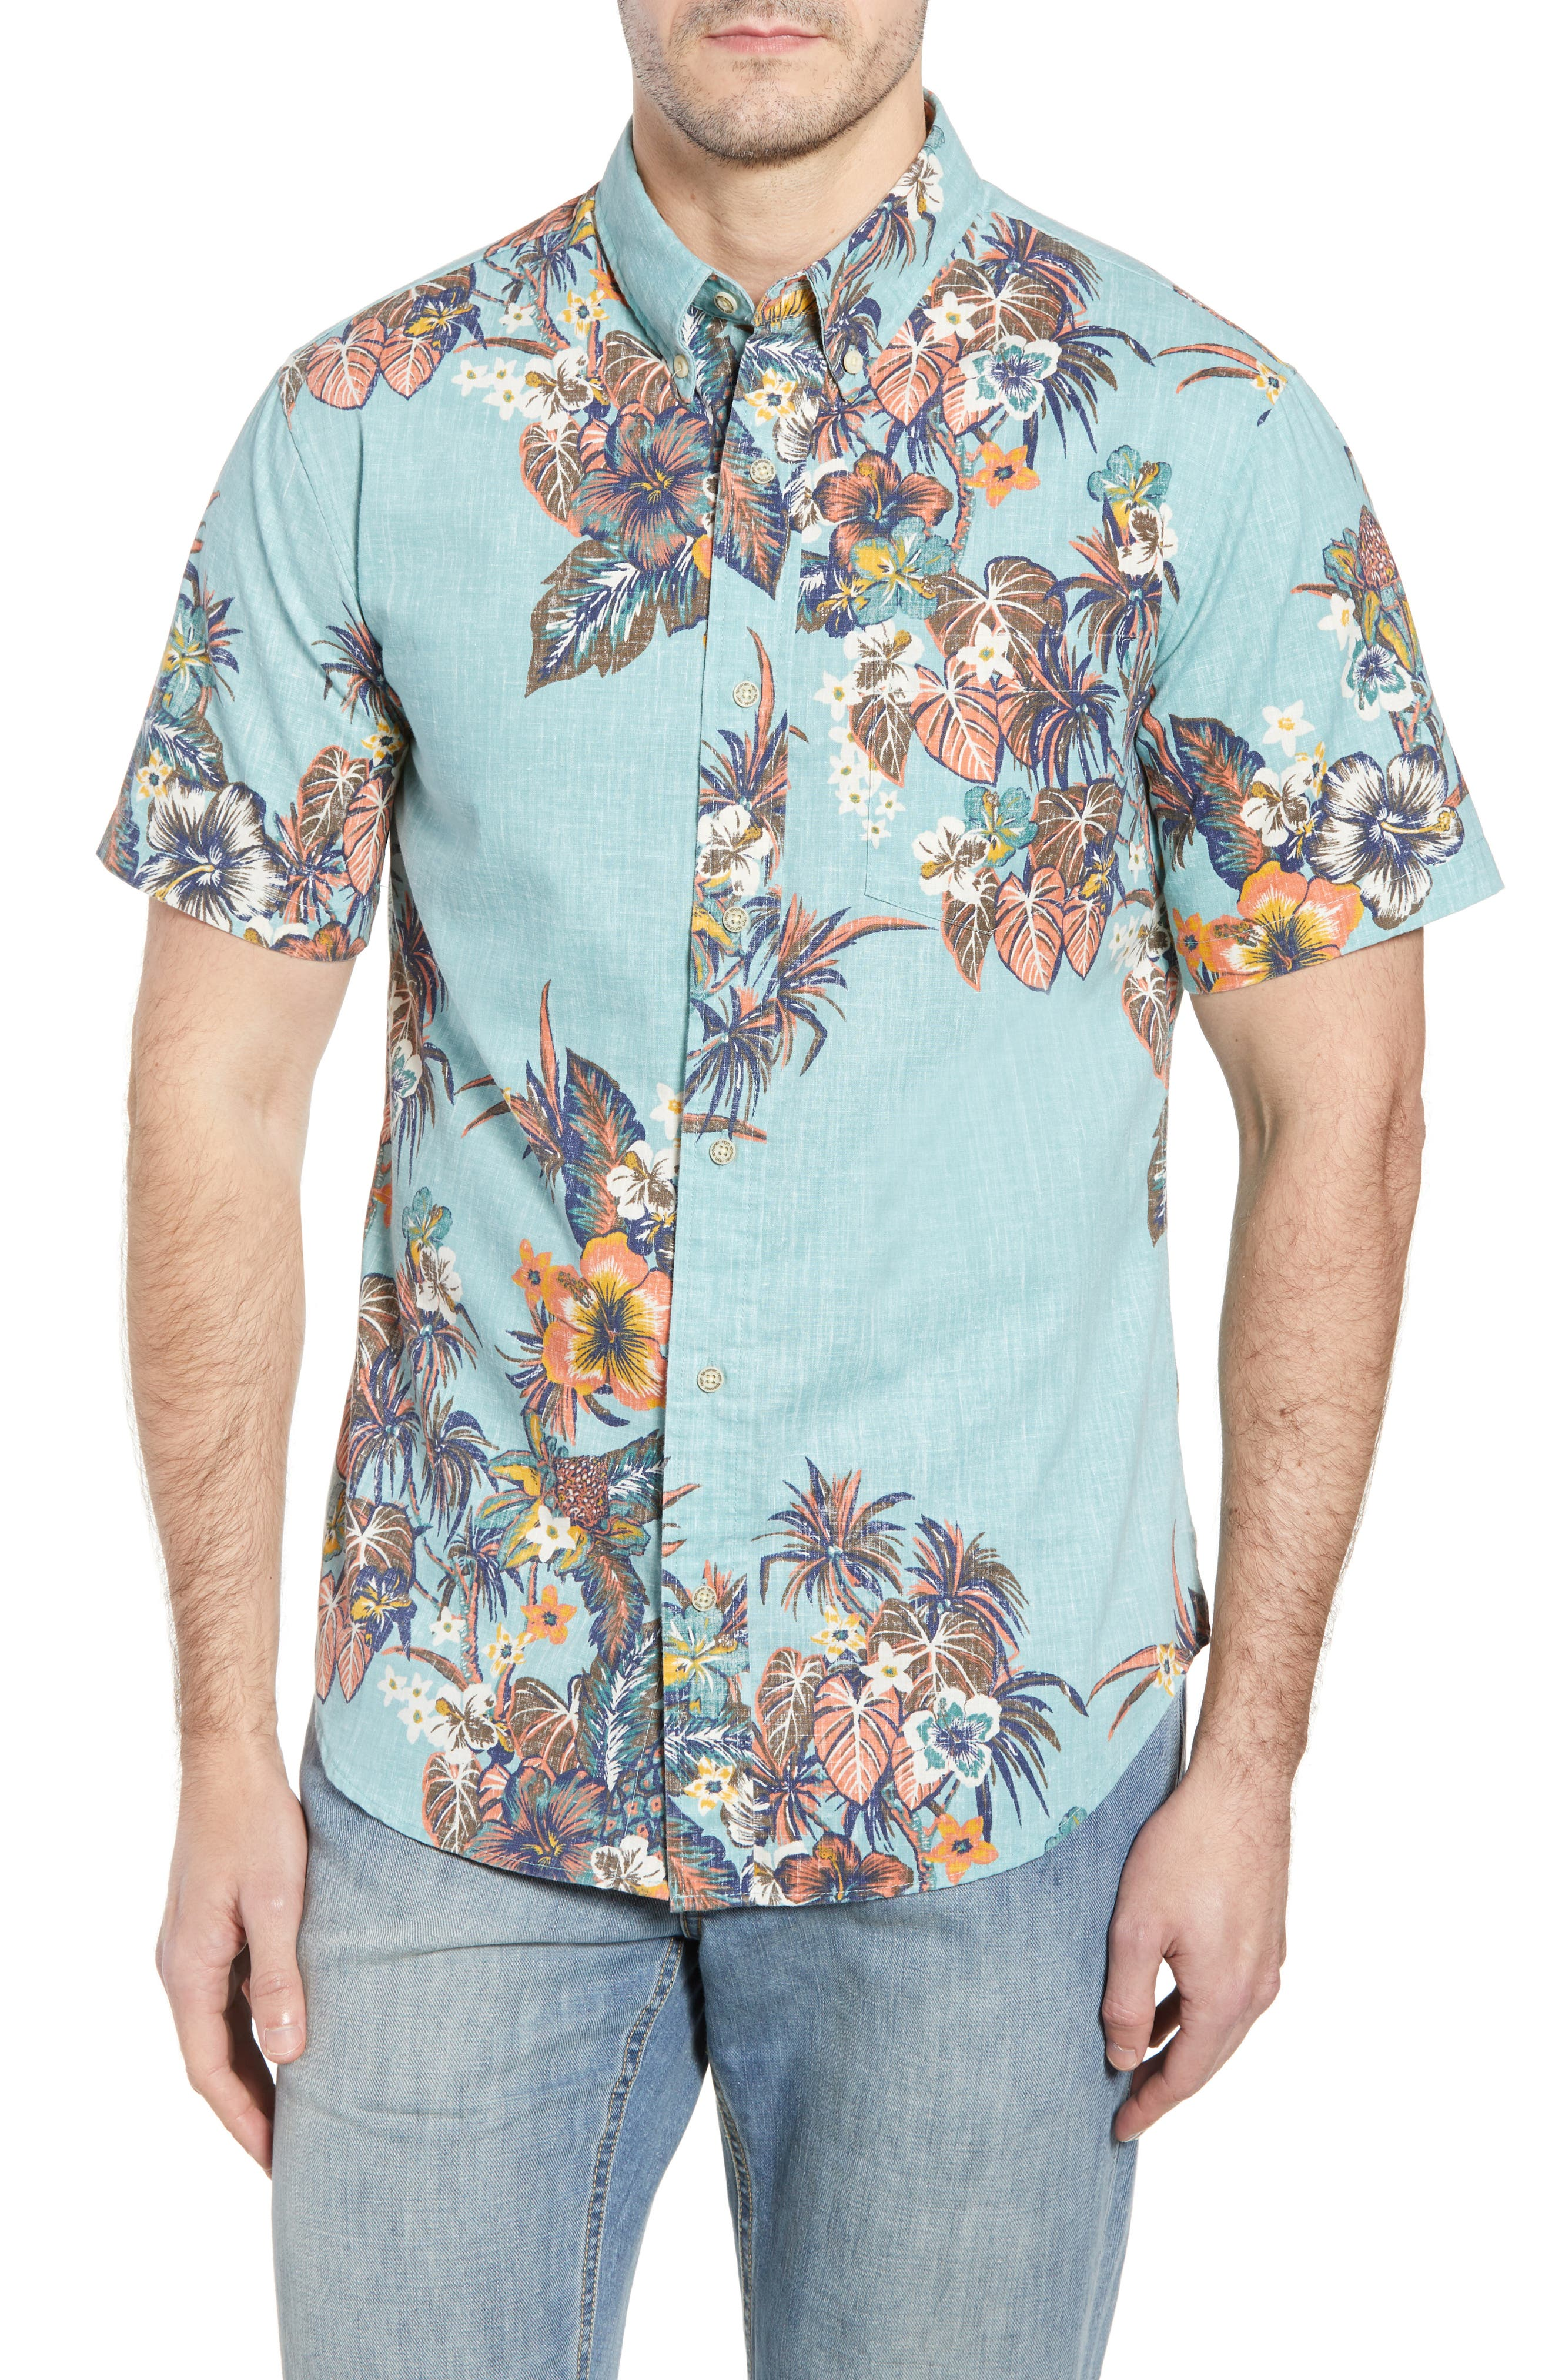 Pupas & Mai Tais Regular Fit Sport Shirt,                         Main,                         color, BLUE 2